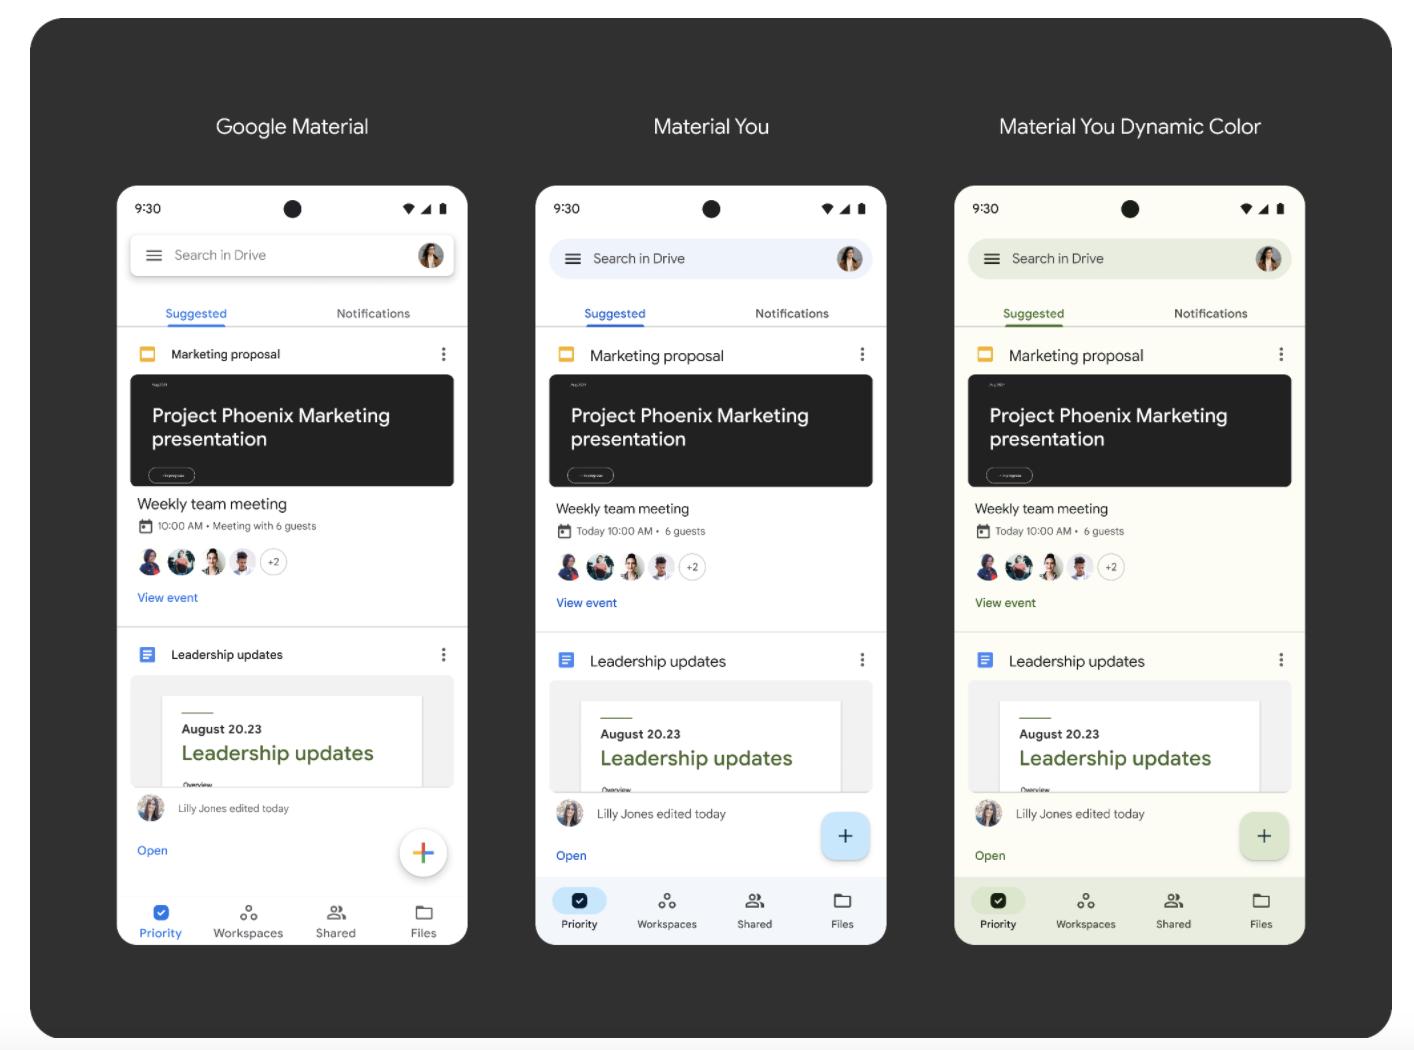 Material You - Google Drive